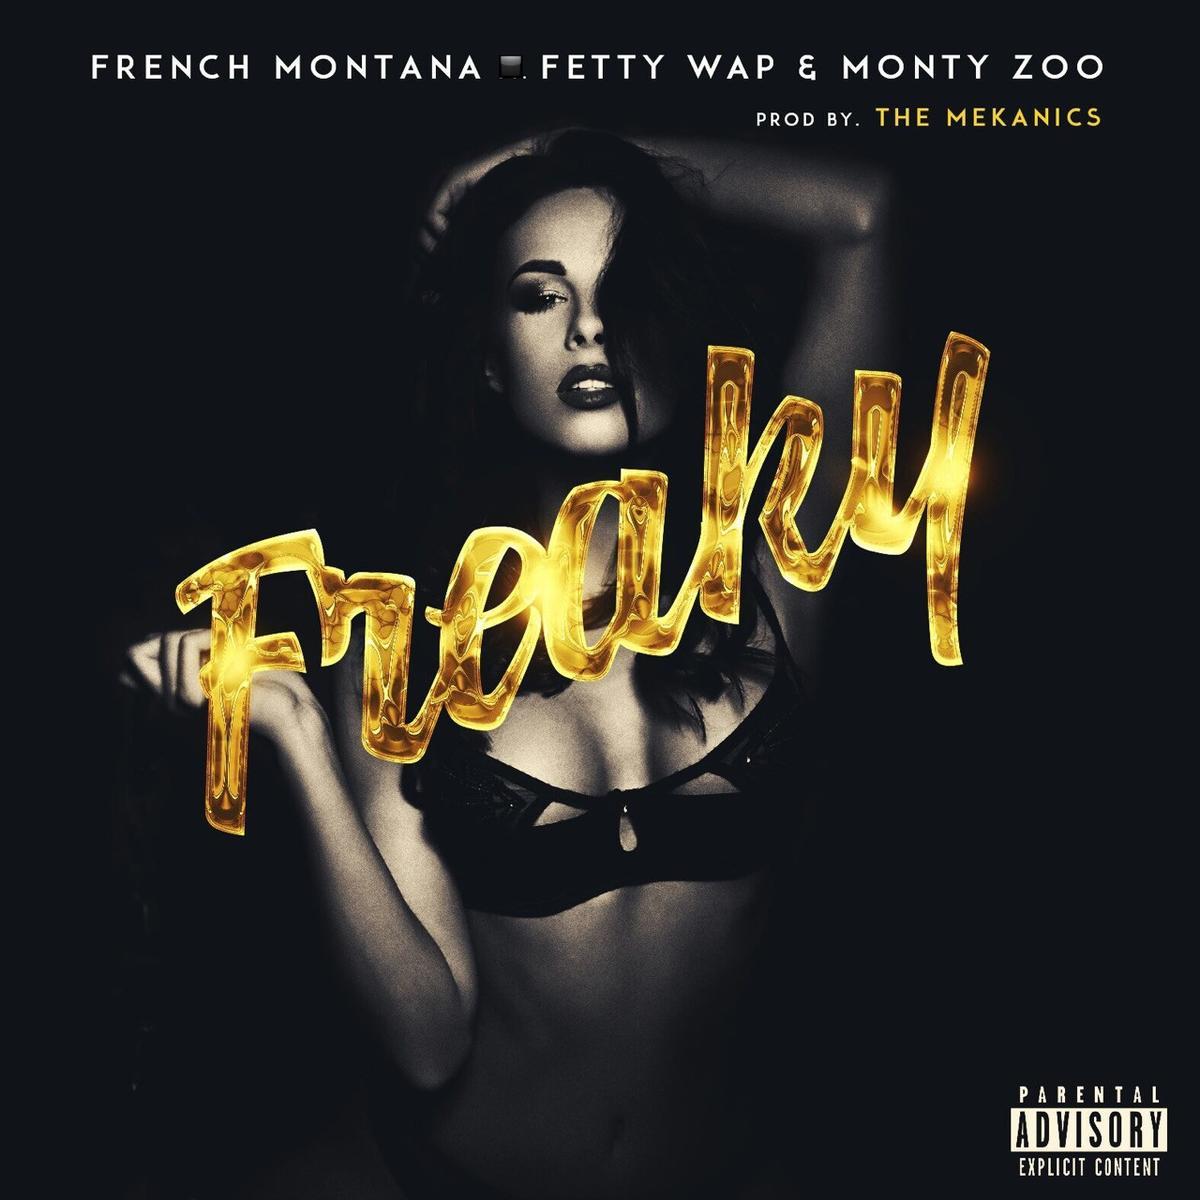 French Montana Fetty Wap Freaky Ft Monty Audio Lyrics Video Download Mp3 Music Lyrics Music Video